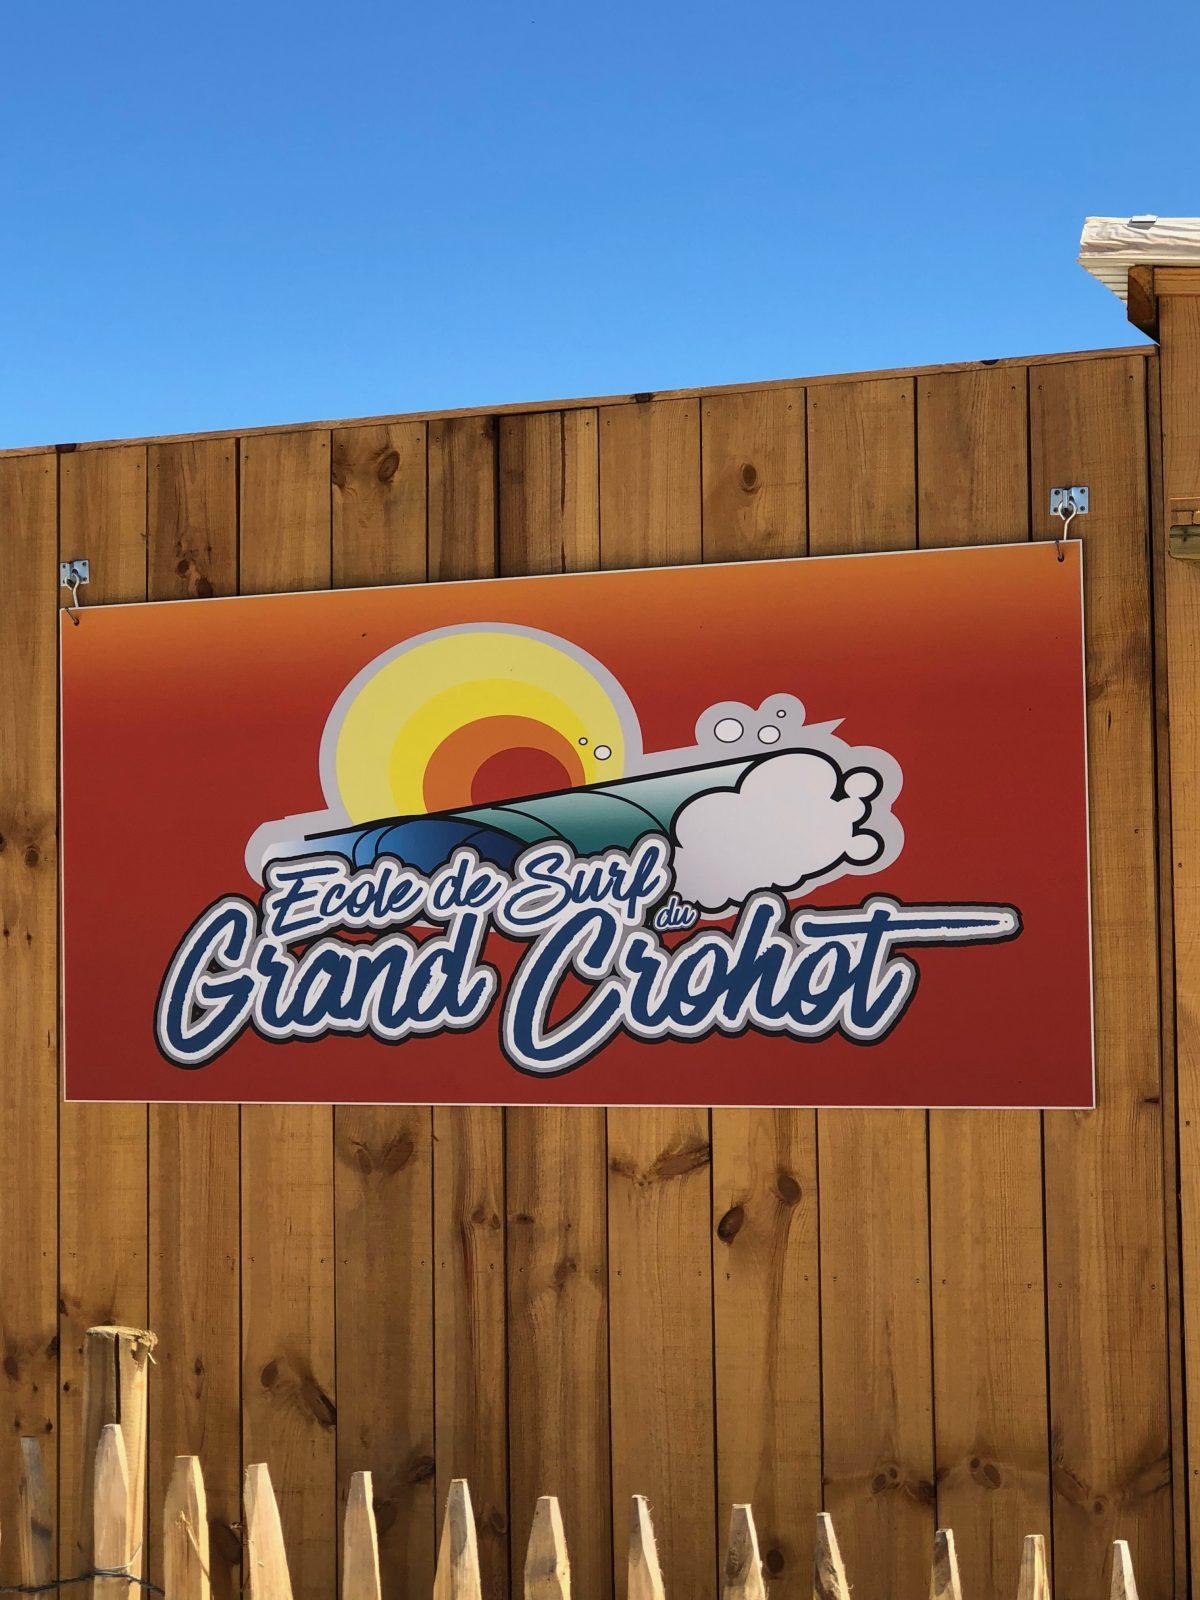 Ecole-surf-grand-crohot 2